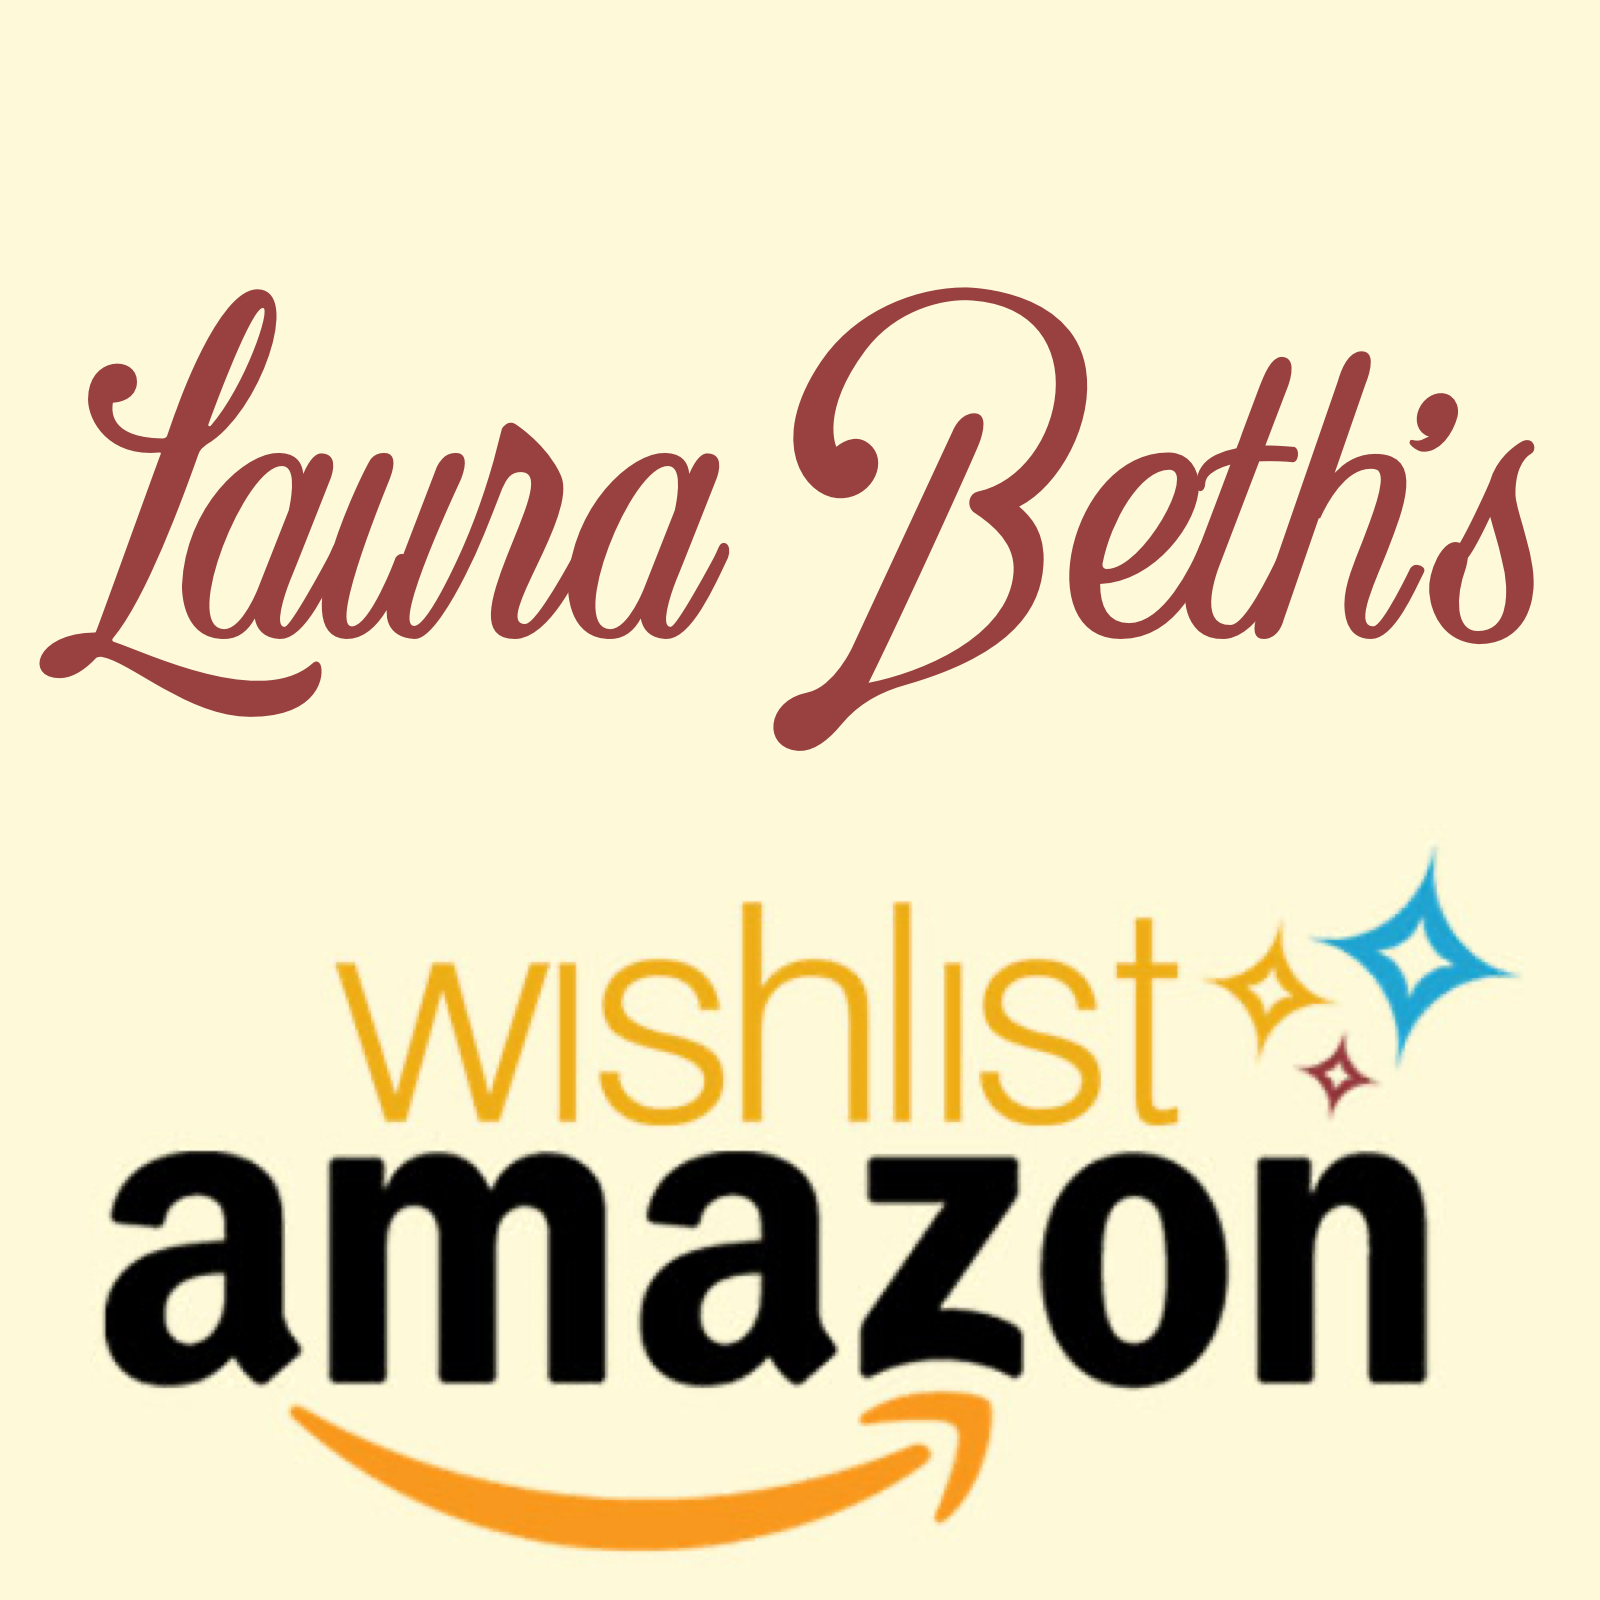 @Laurabethfinley Laura Beth's Wish List Link Thumbnail | Linktree